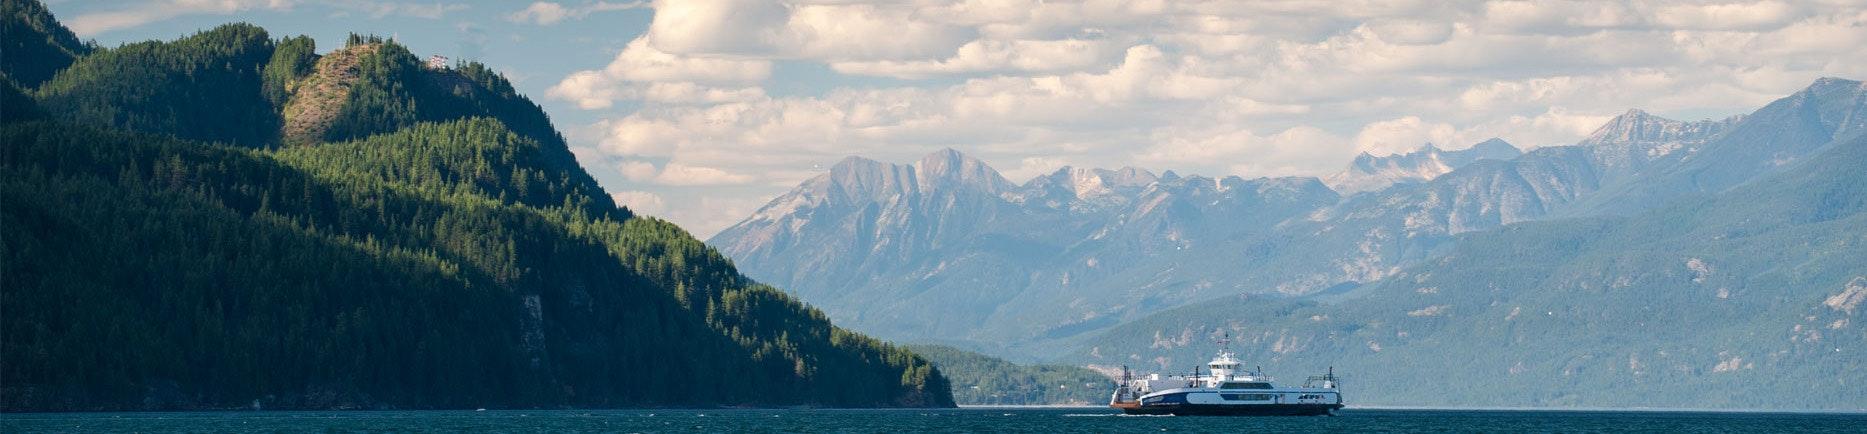 Schüleraustausch Kanada Kootenay Lake